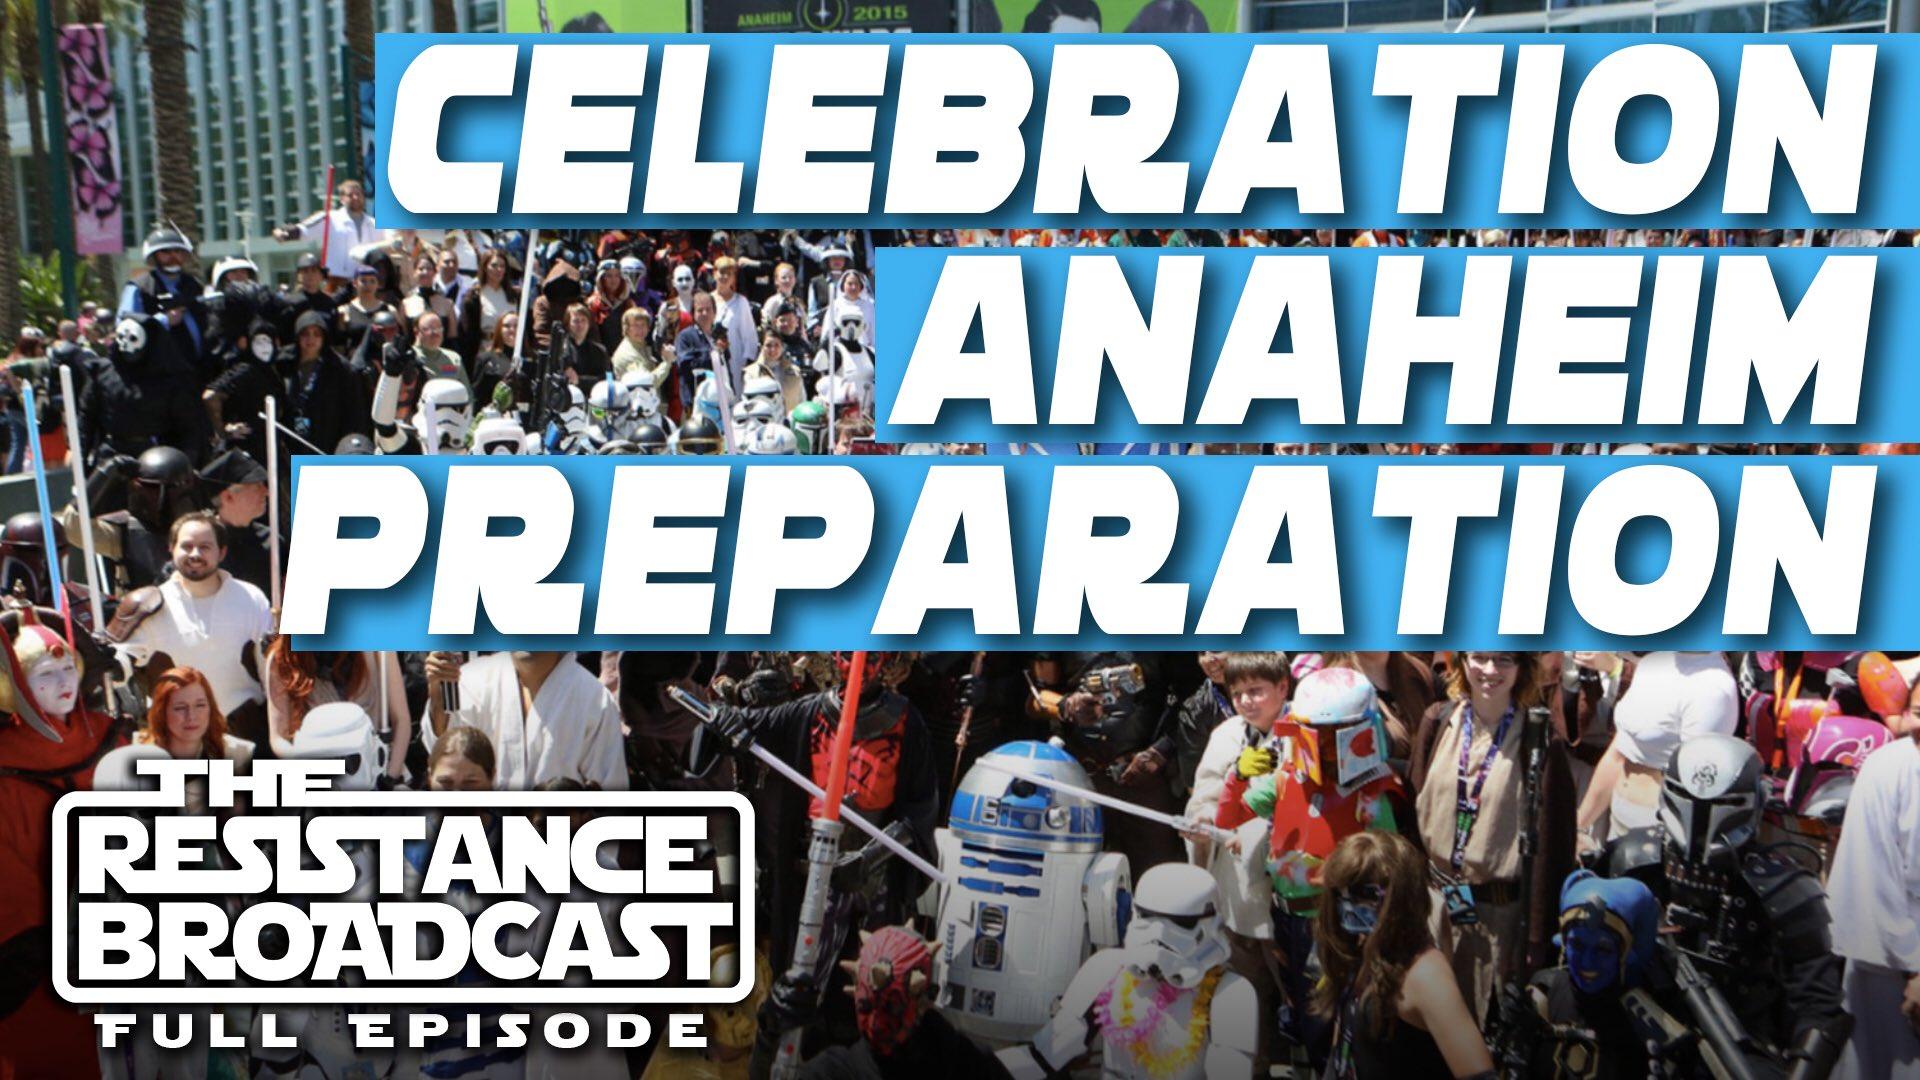 The Resistance Broadcast - Star Wars Celebration Anaheim: Tips